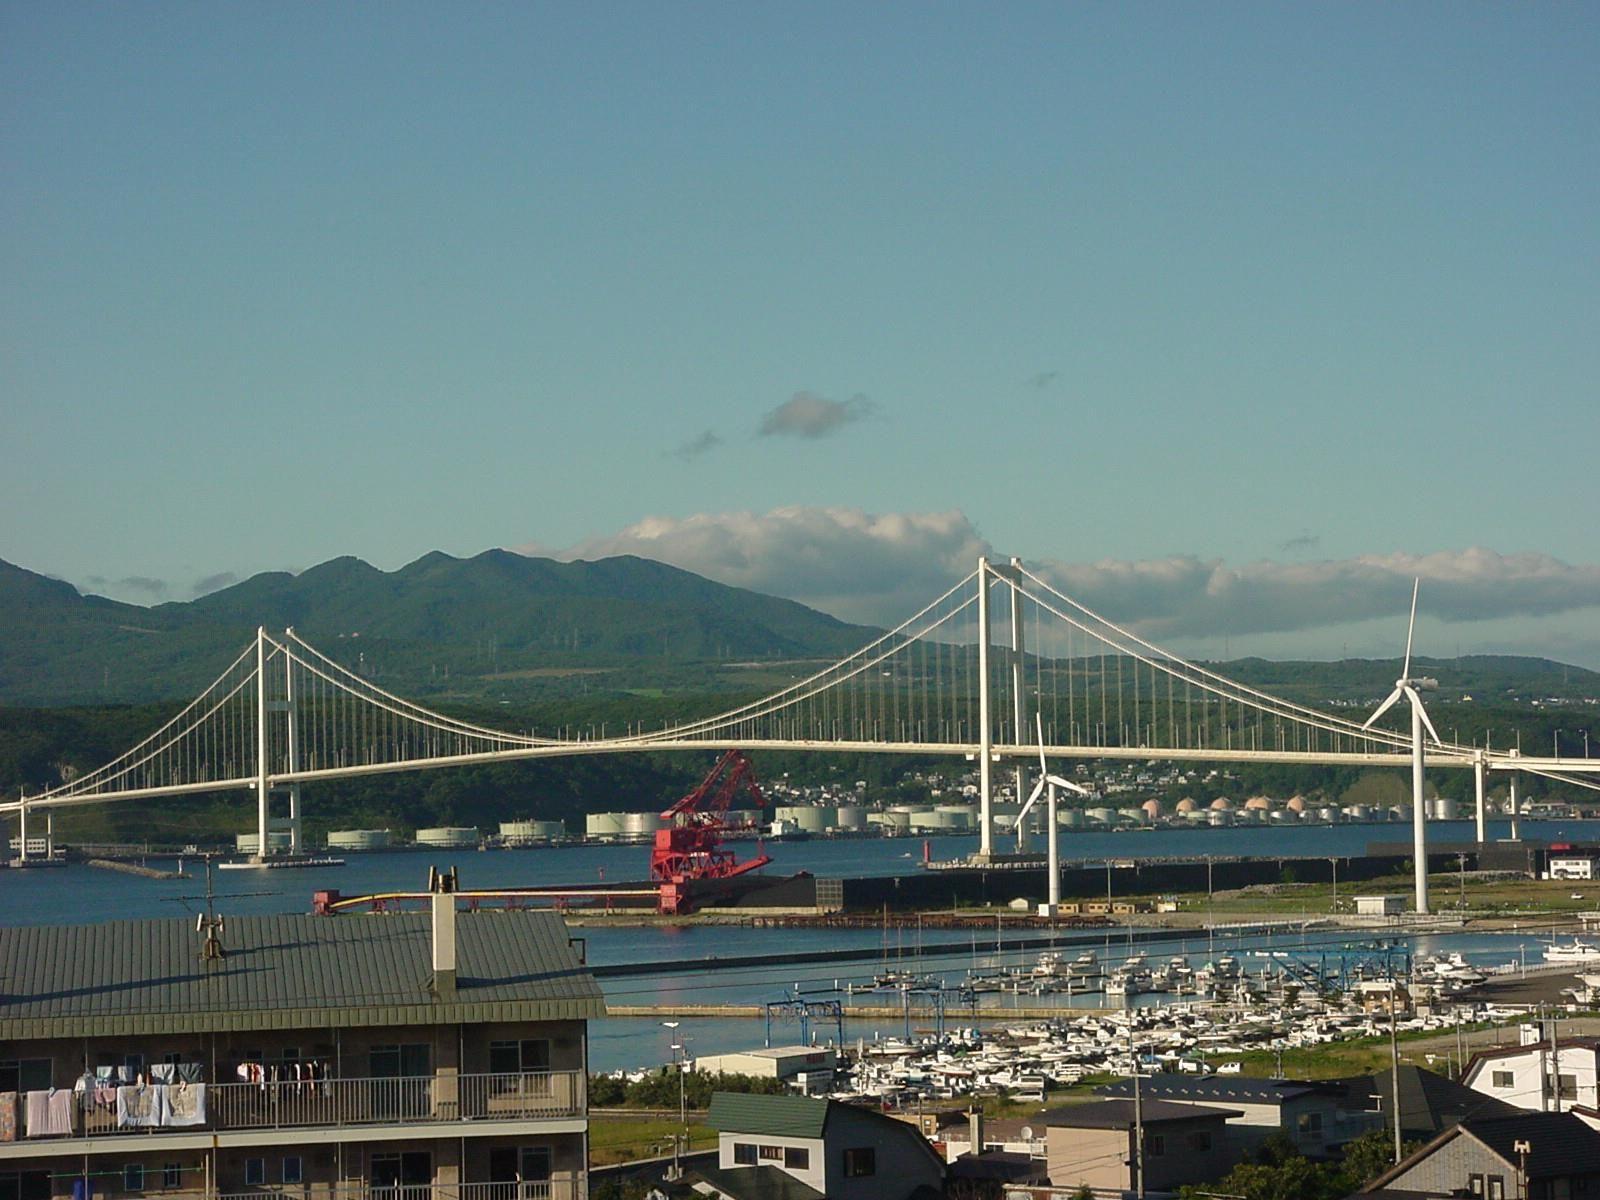 hakucho ohashi bridge muroran city hokkaido japan the longest